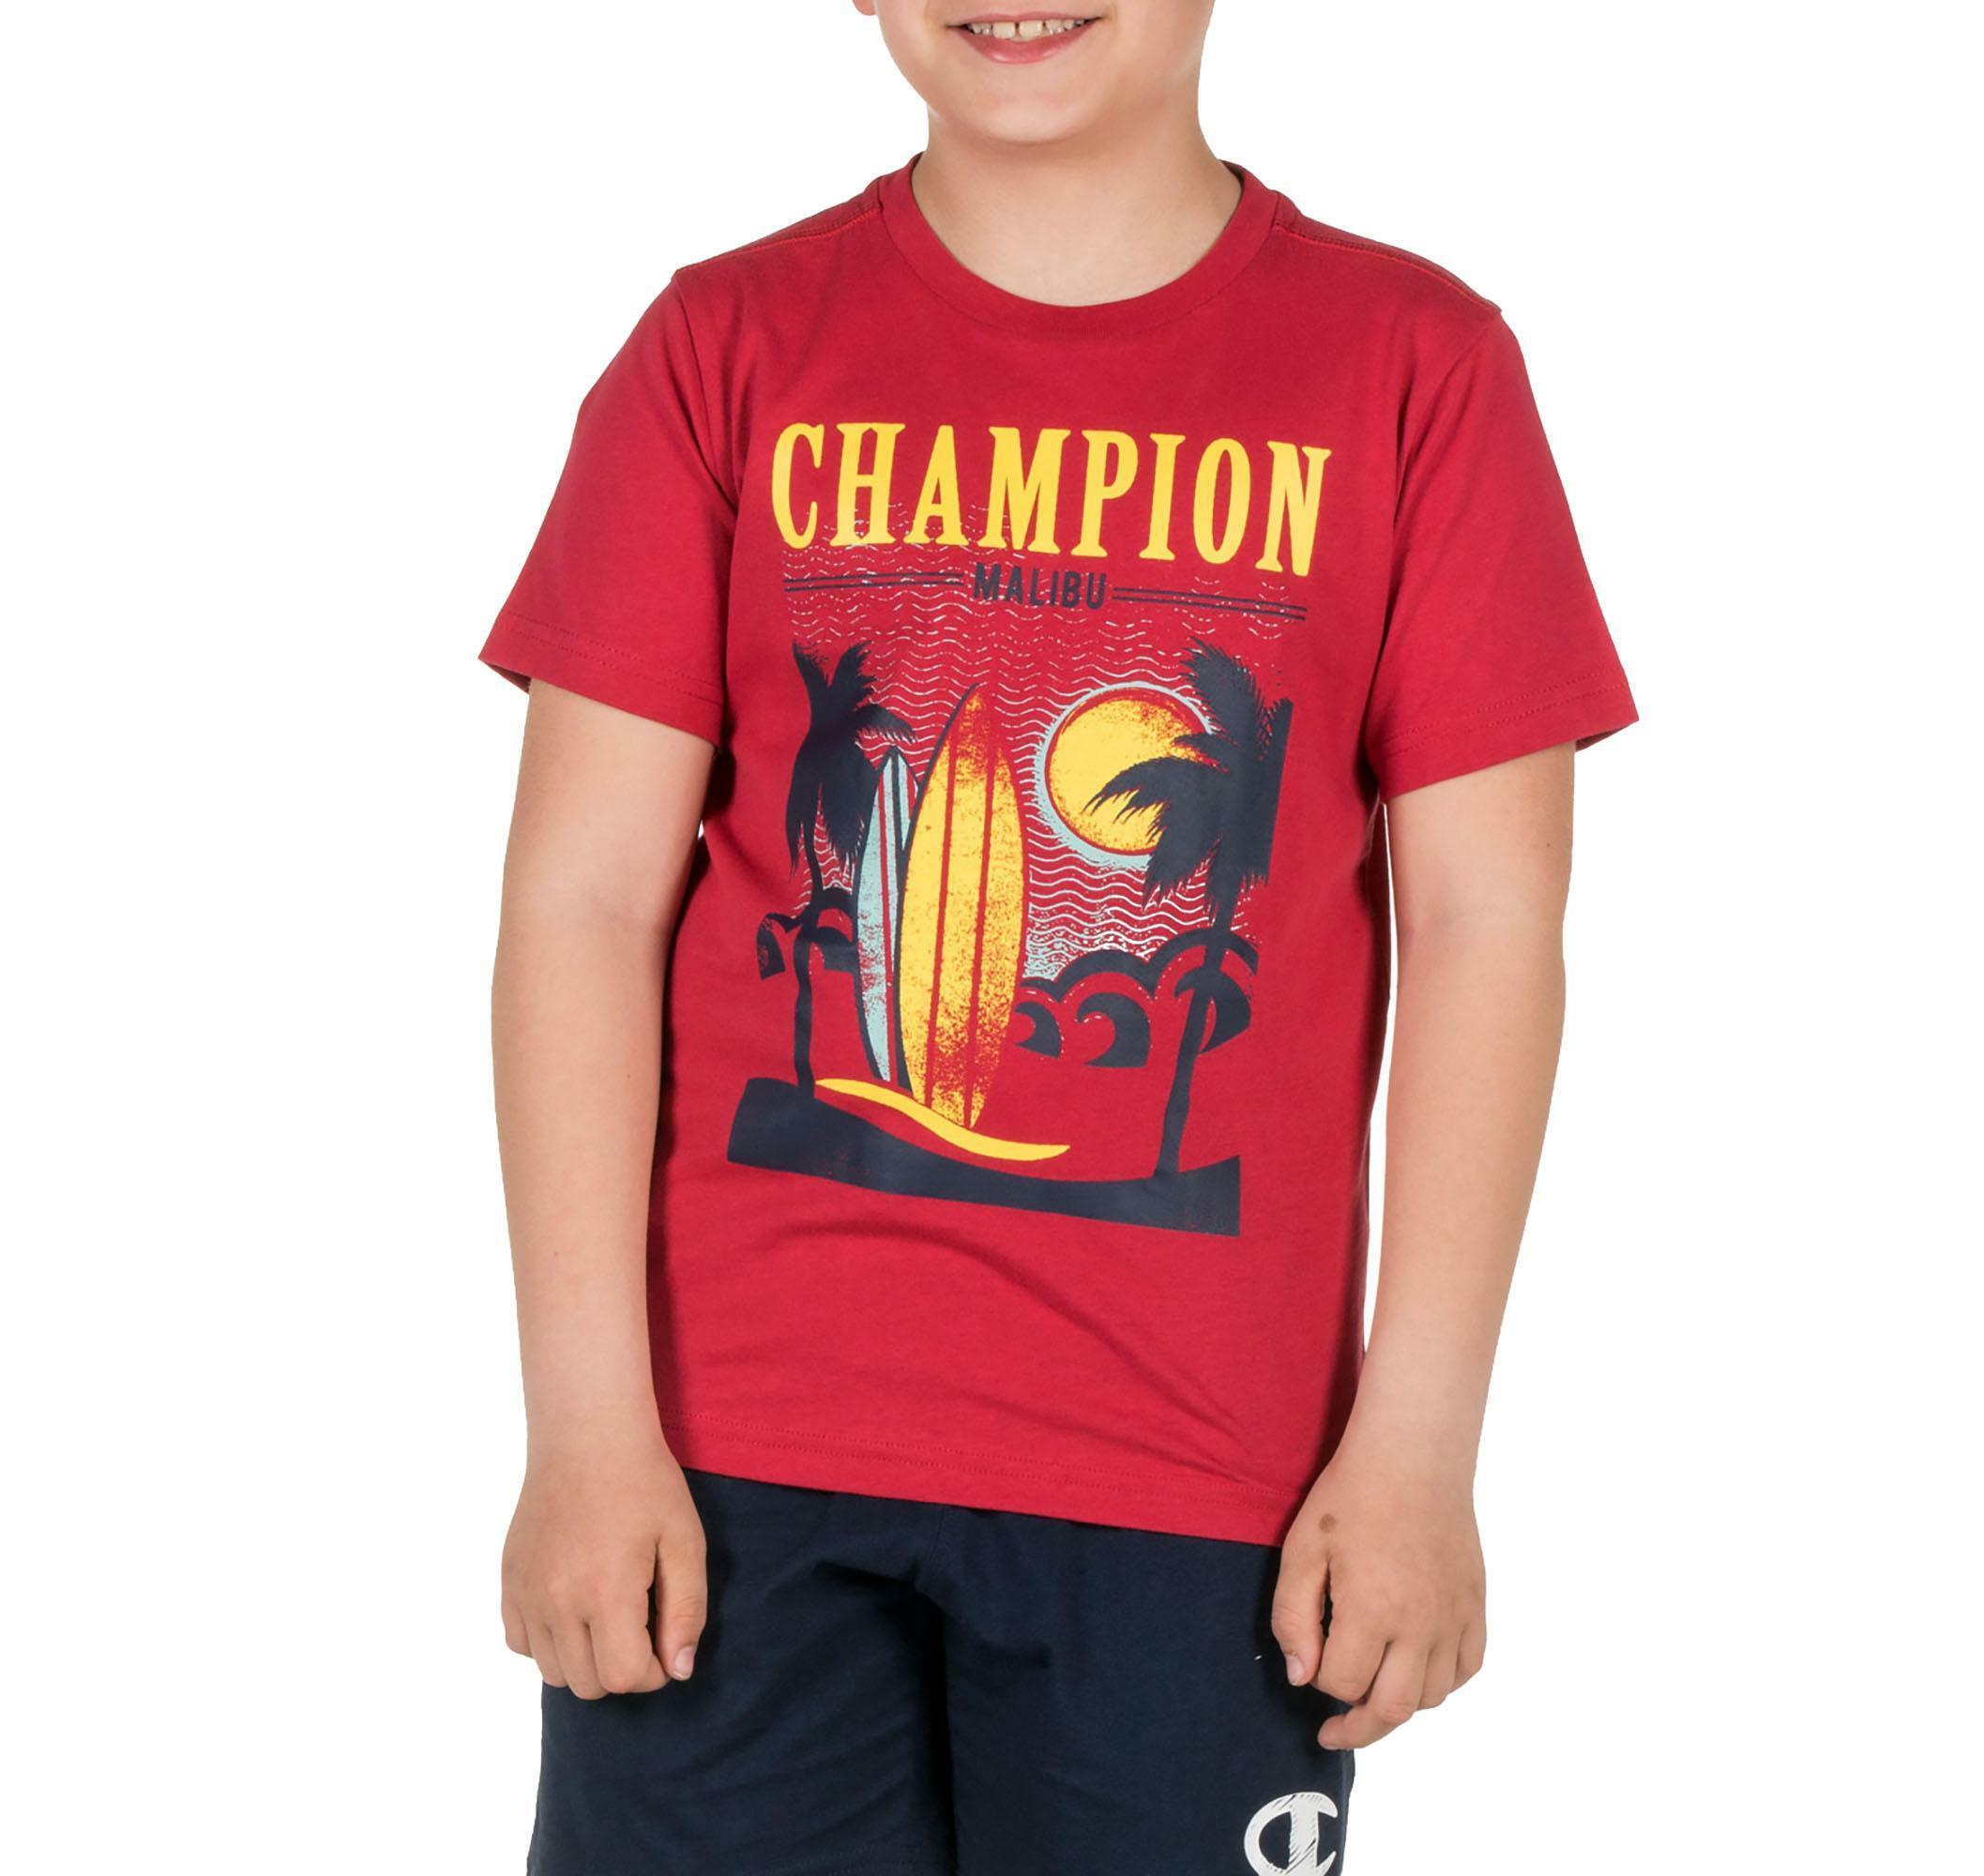 champion t-shirt bambino rossa 304946ms038